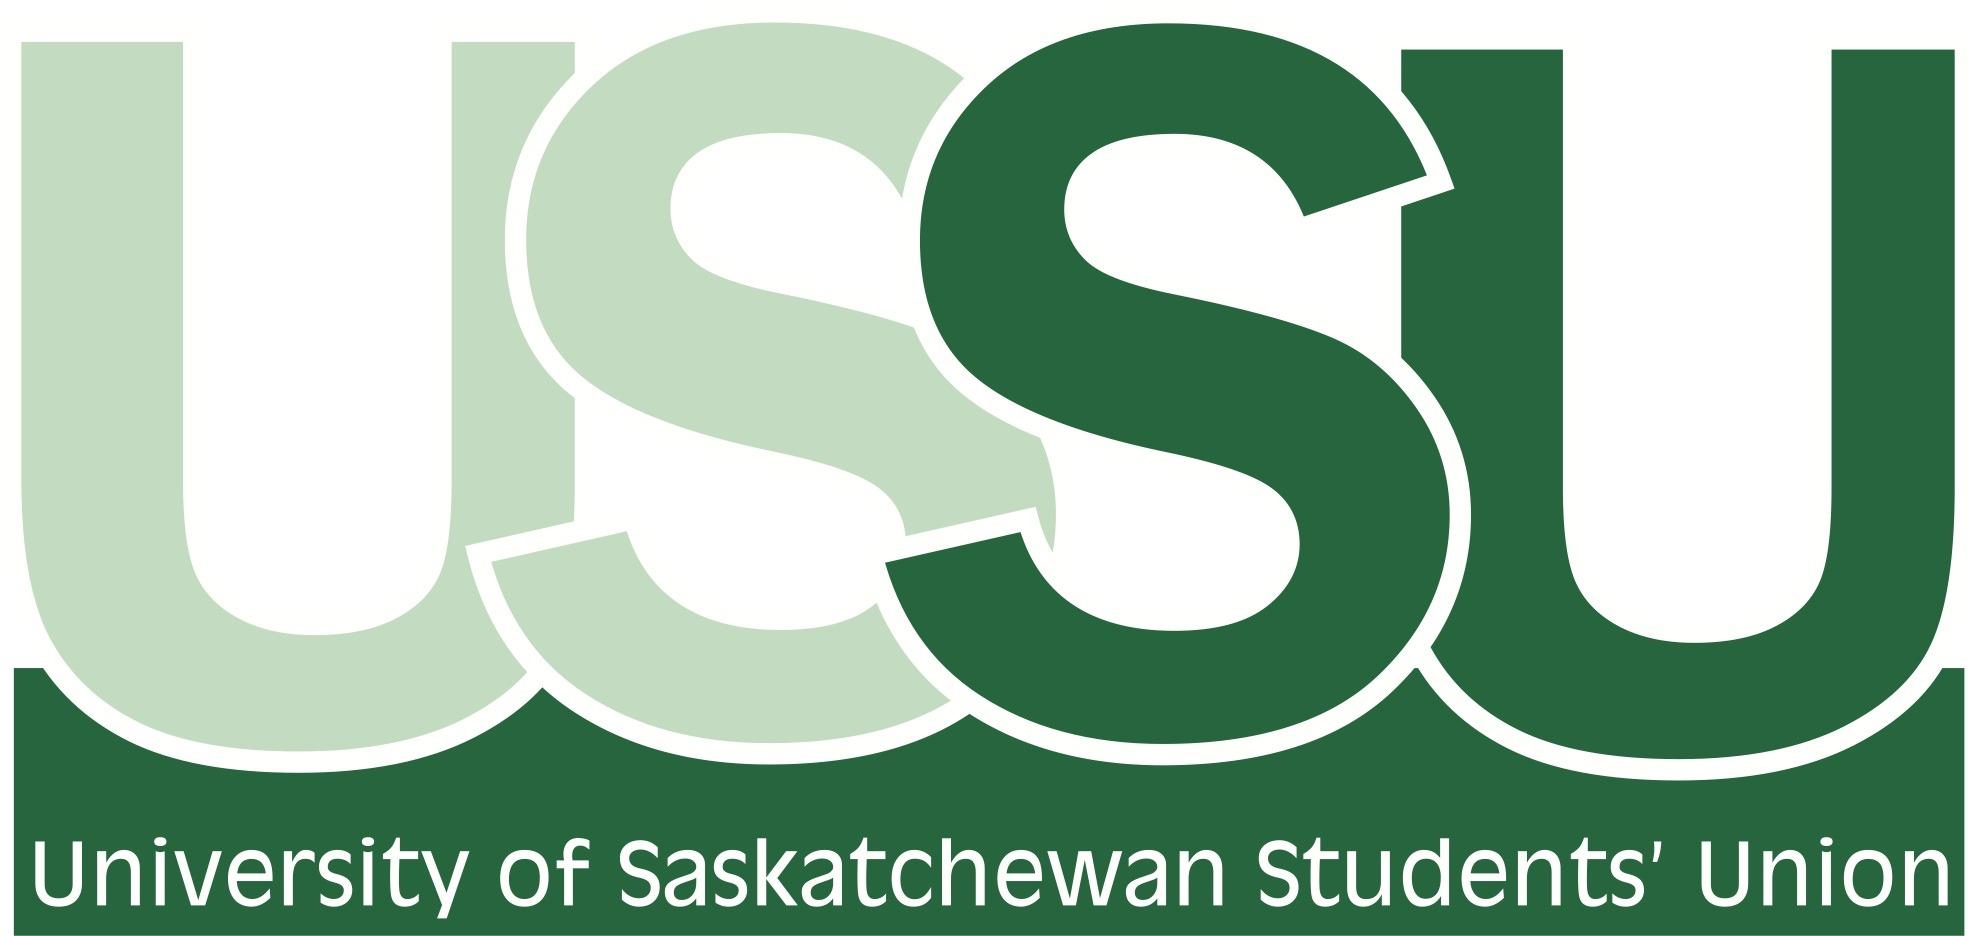 Ussu Logos U Of S Students Union